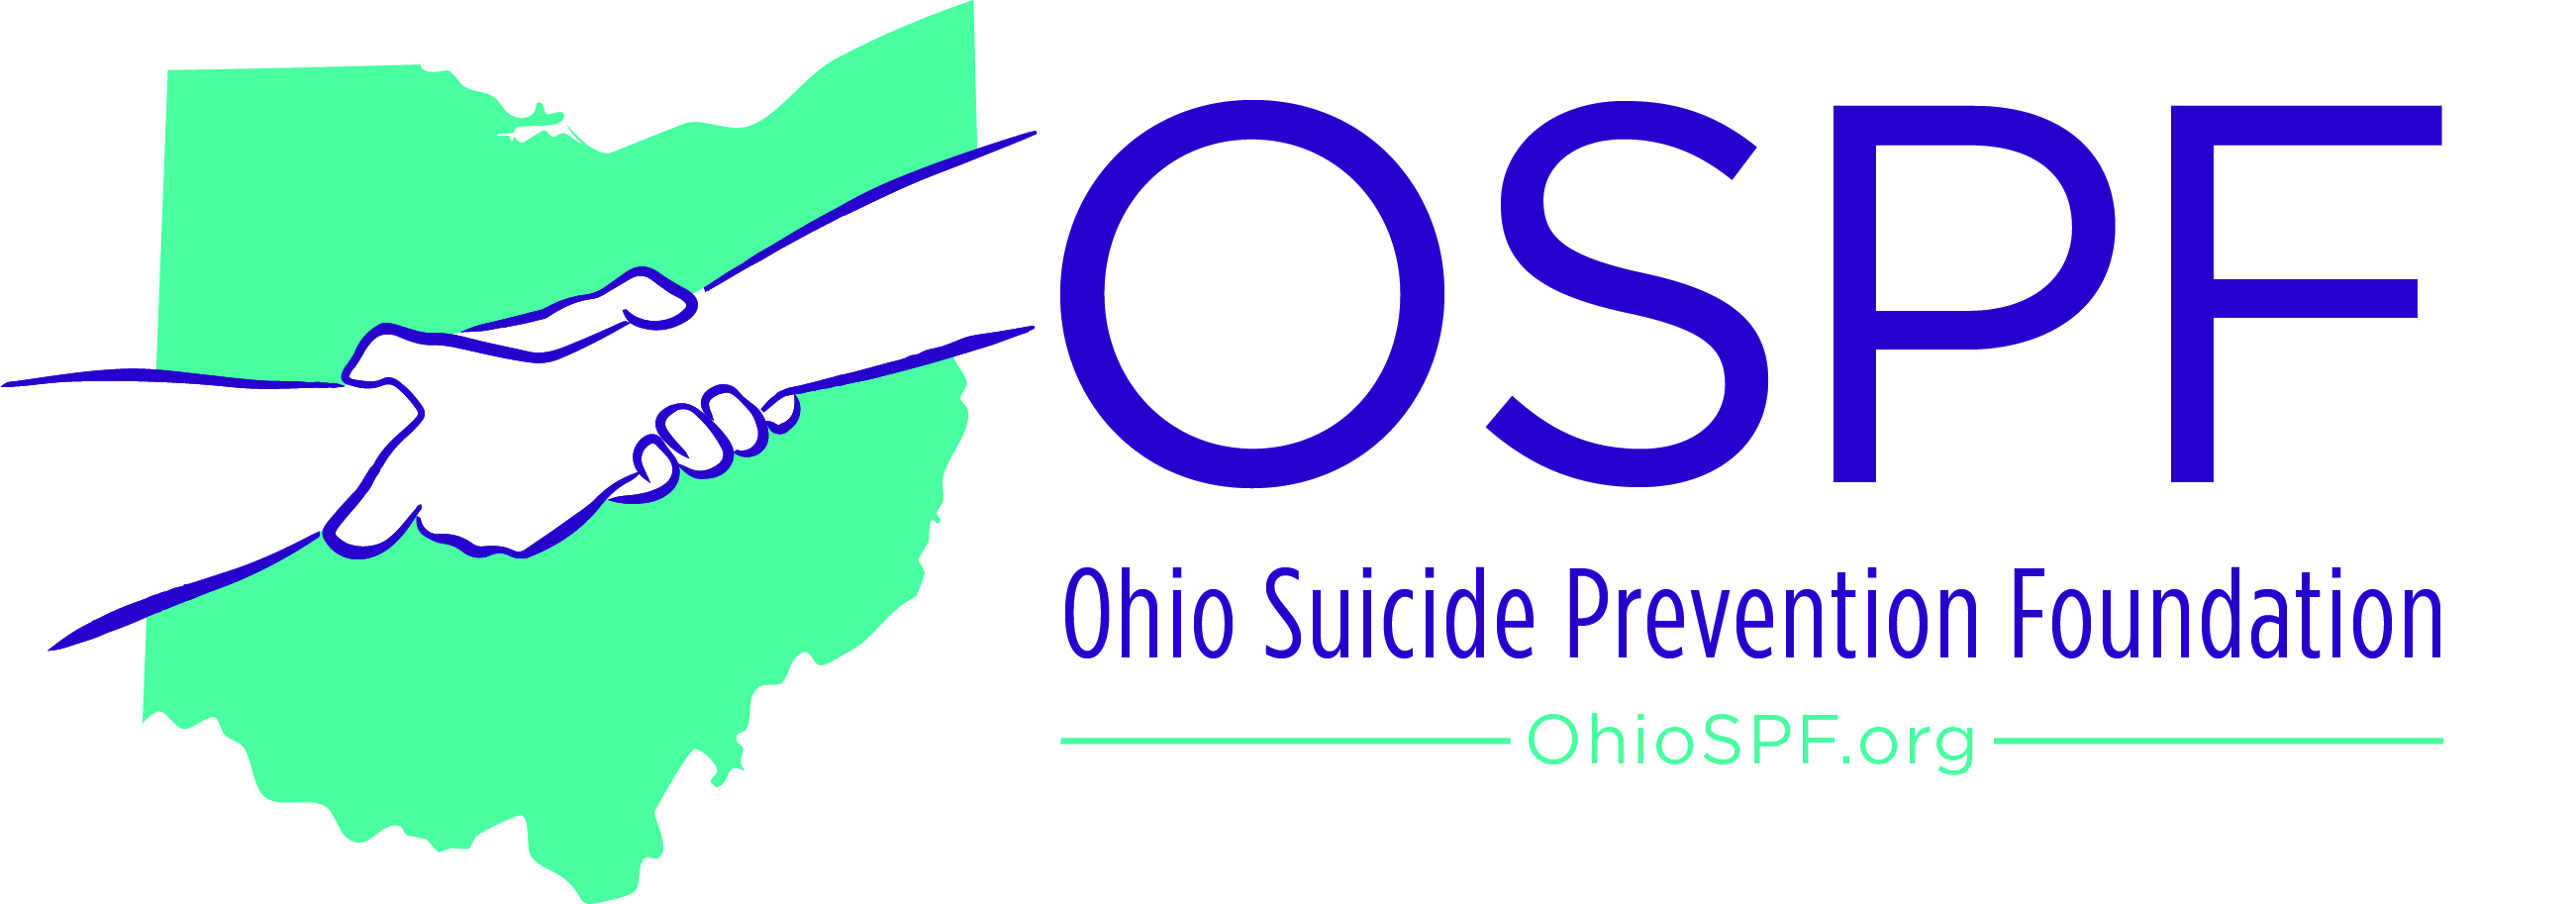 Ohio Suicide Prevention Foundation